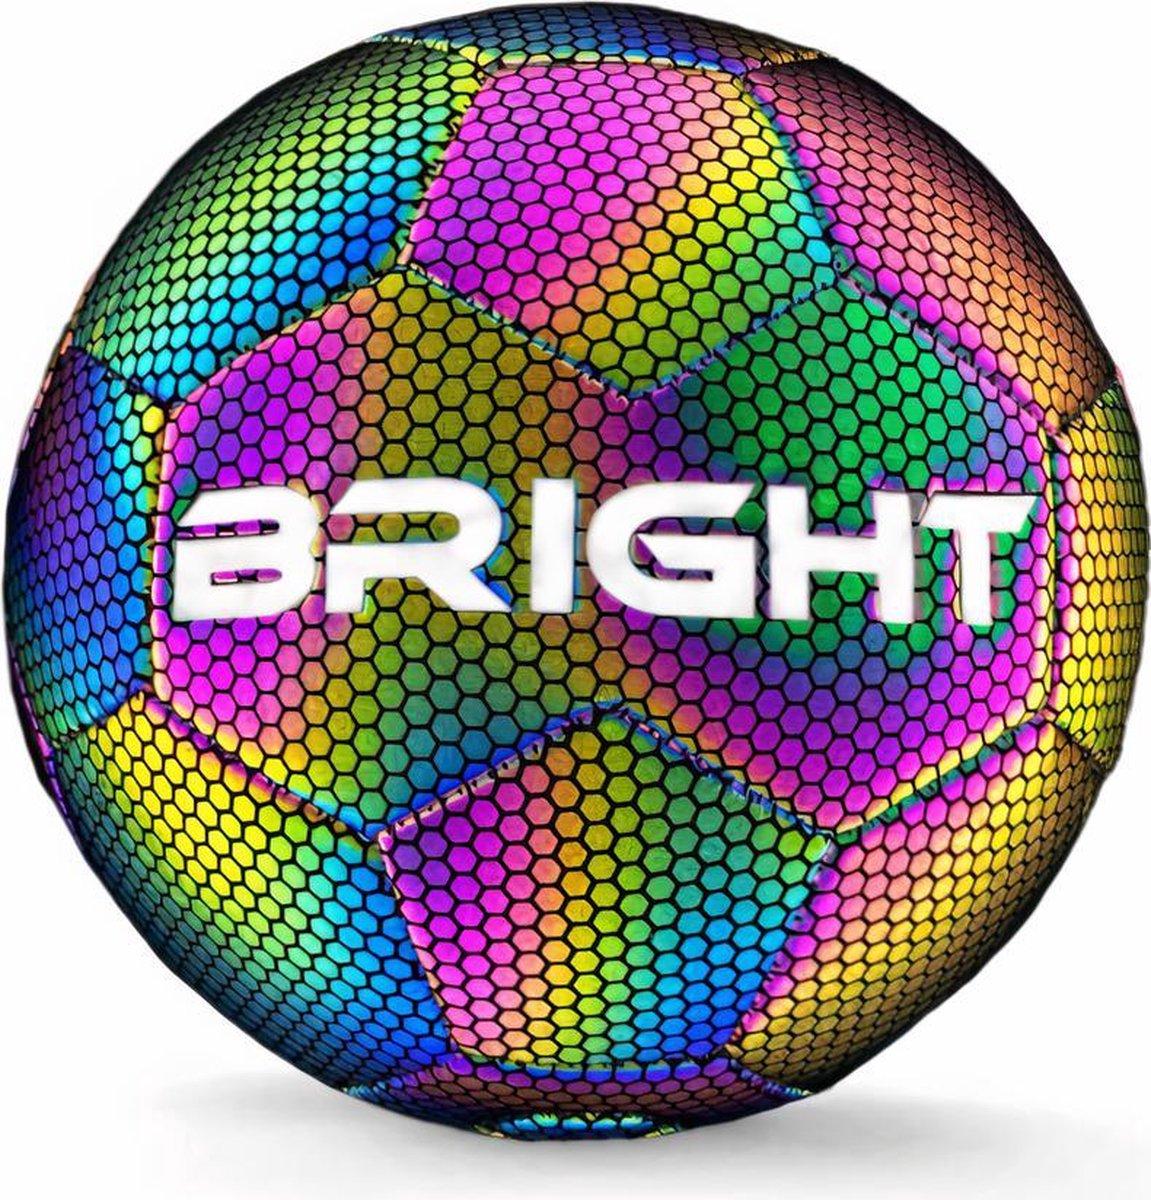 The BRIGHT  Lichtgevende Voetbal   Reflecterend   Holografisch   Glow in the Dark   Kinderen en Volw